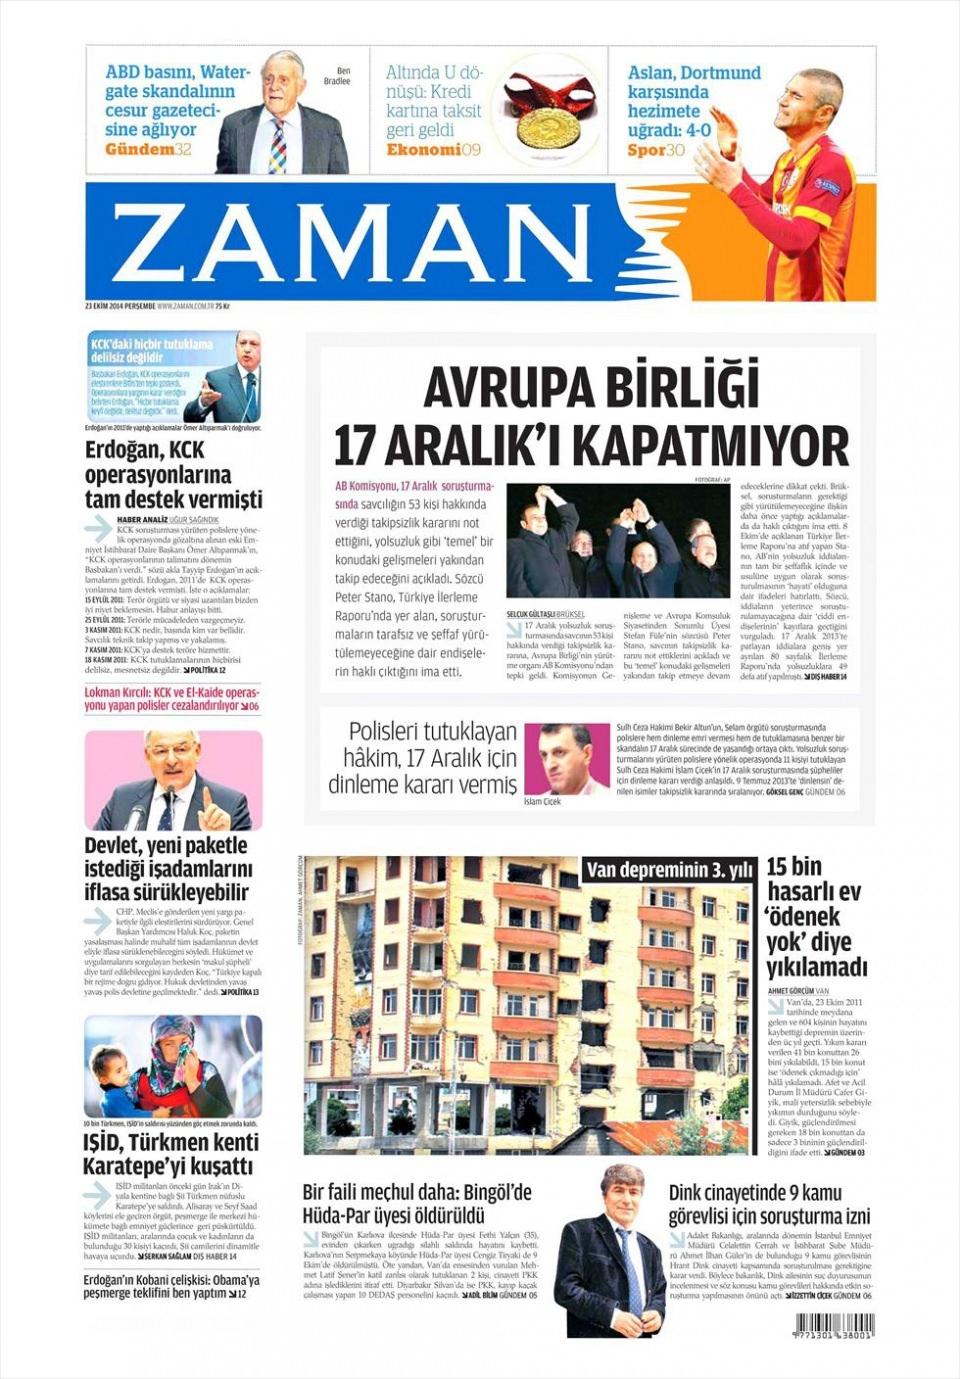 23 Ekim 2014 gazete manşetleri 24